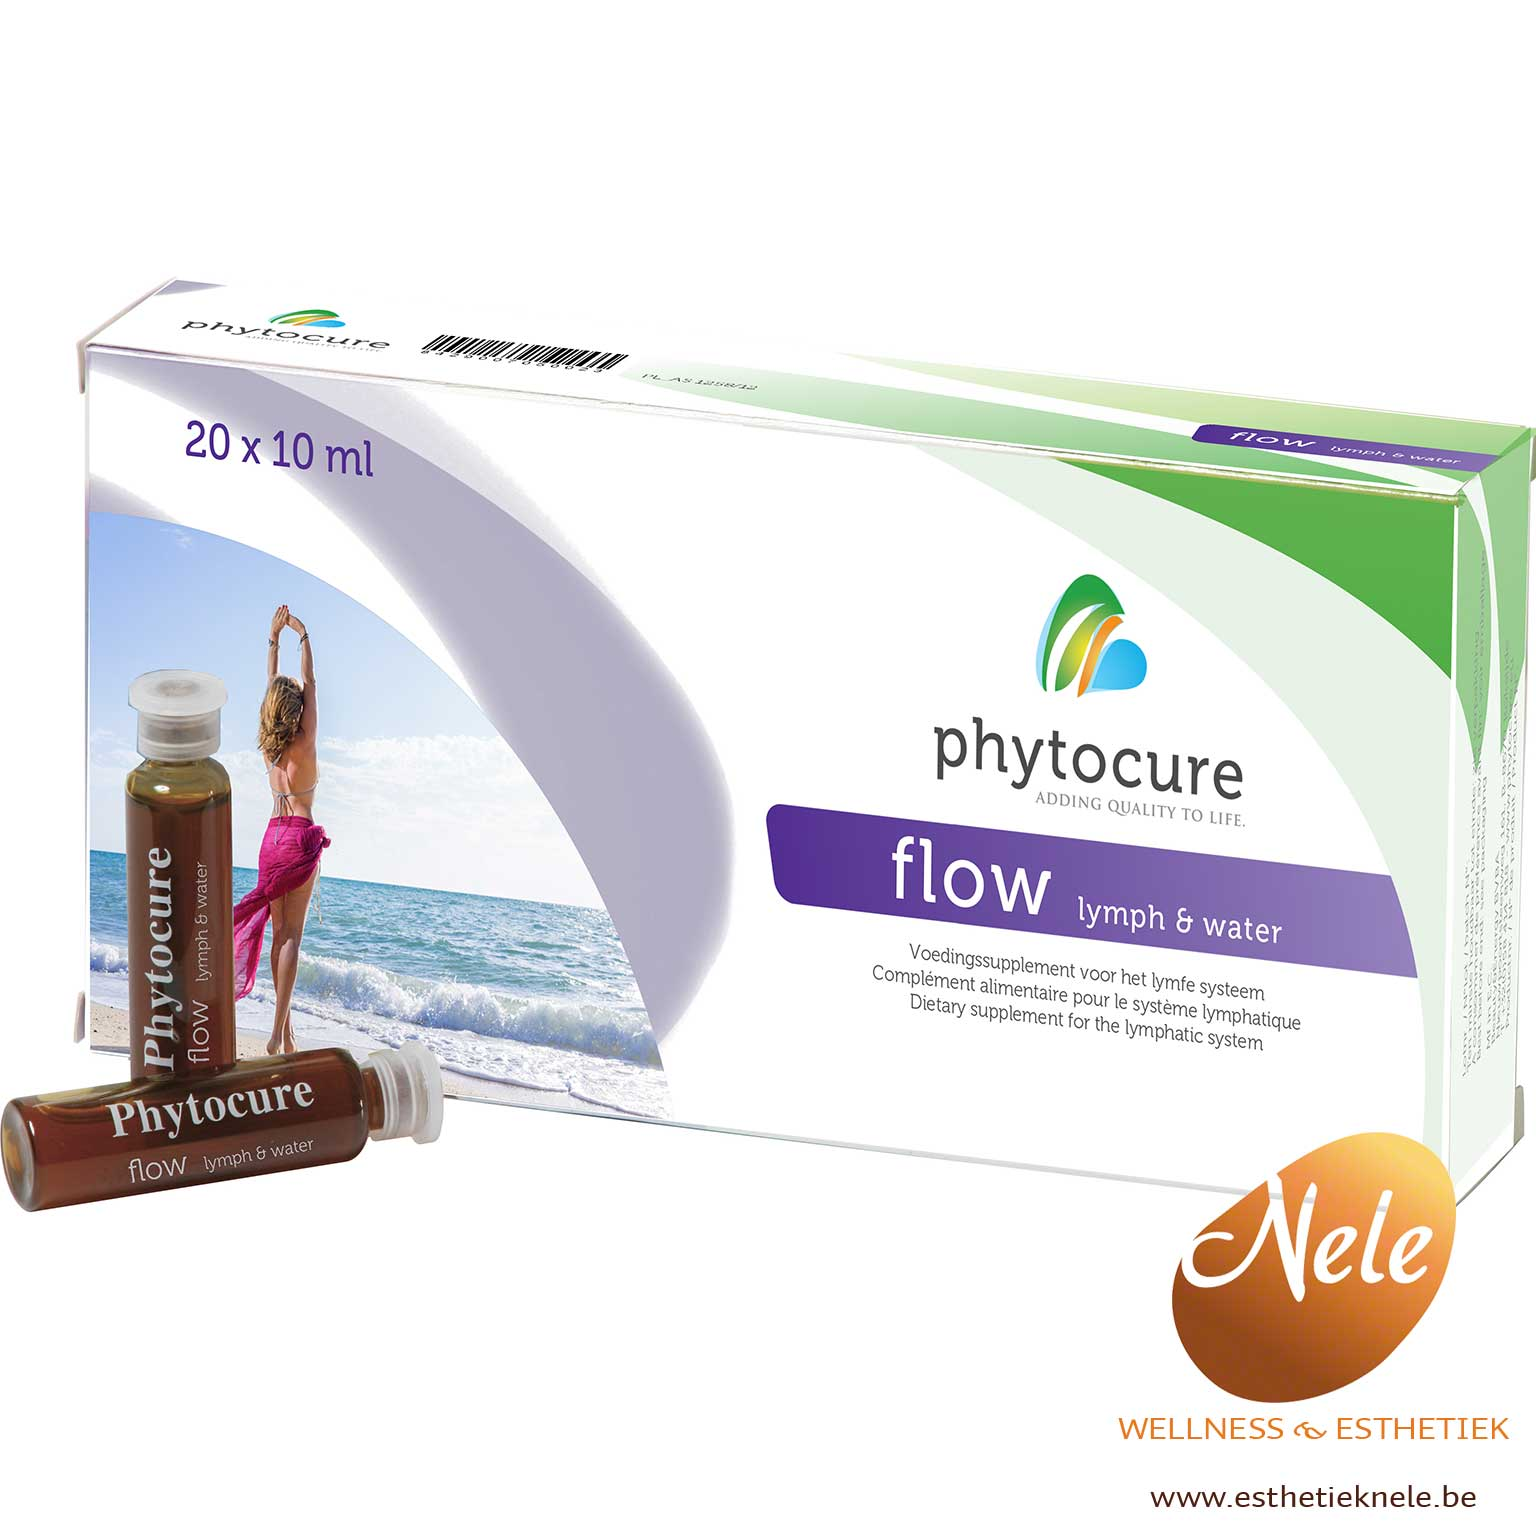 Phytocure Flow Wellness Esthetiek Nele